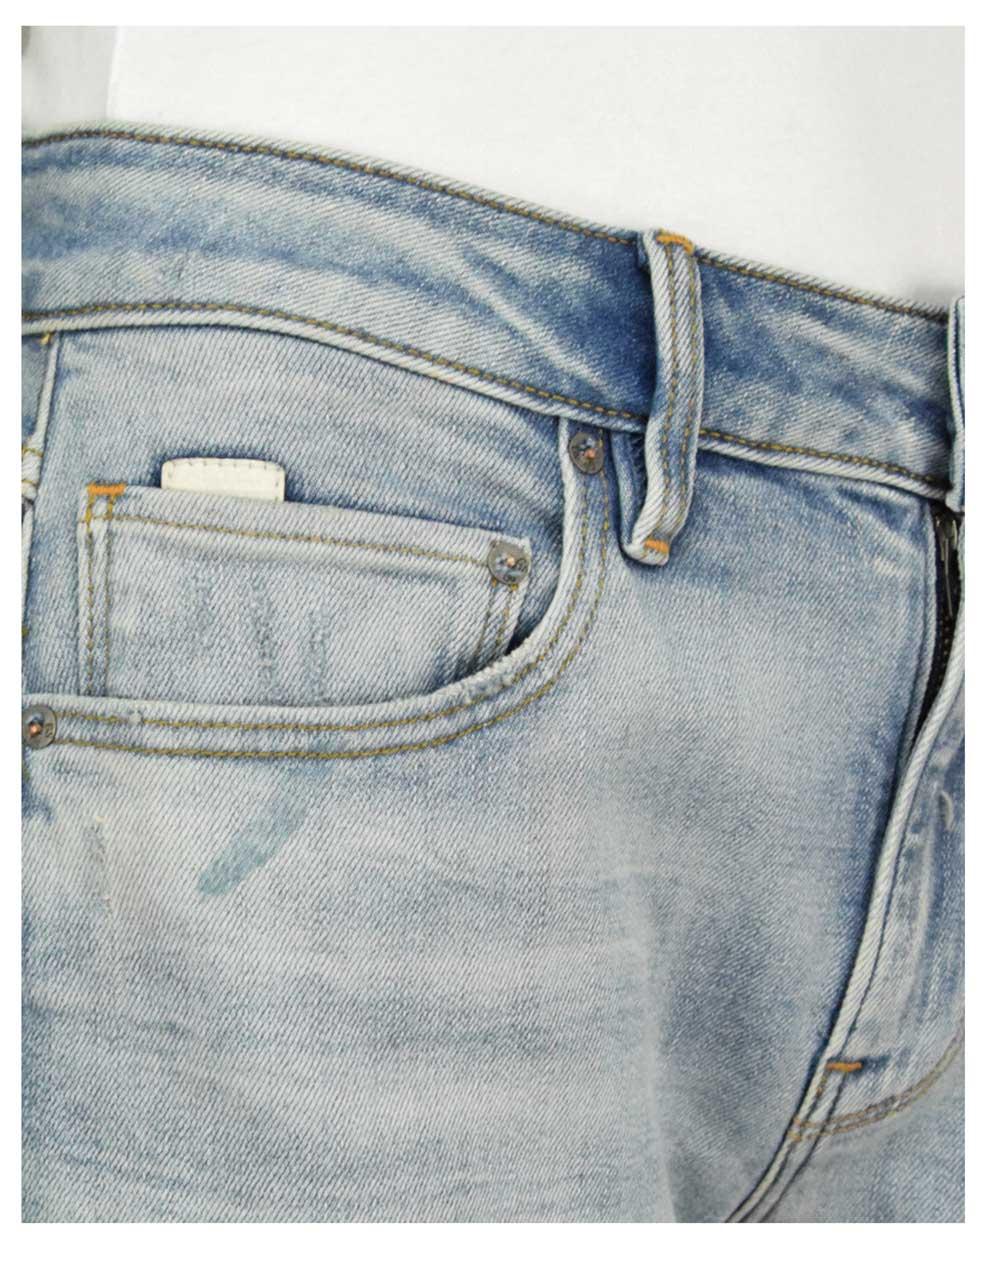 G-Star Raw Kate Boyfriend (D15264-C052-B819) Antic Faded Lapo Blue Destroyed